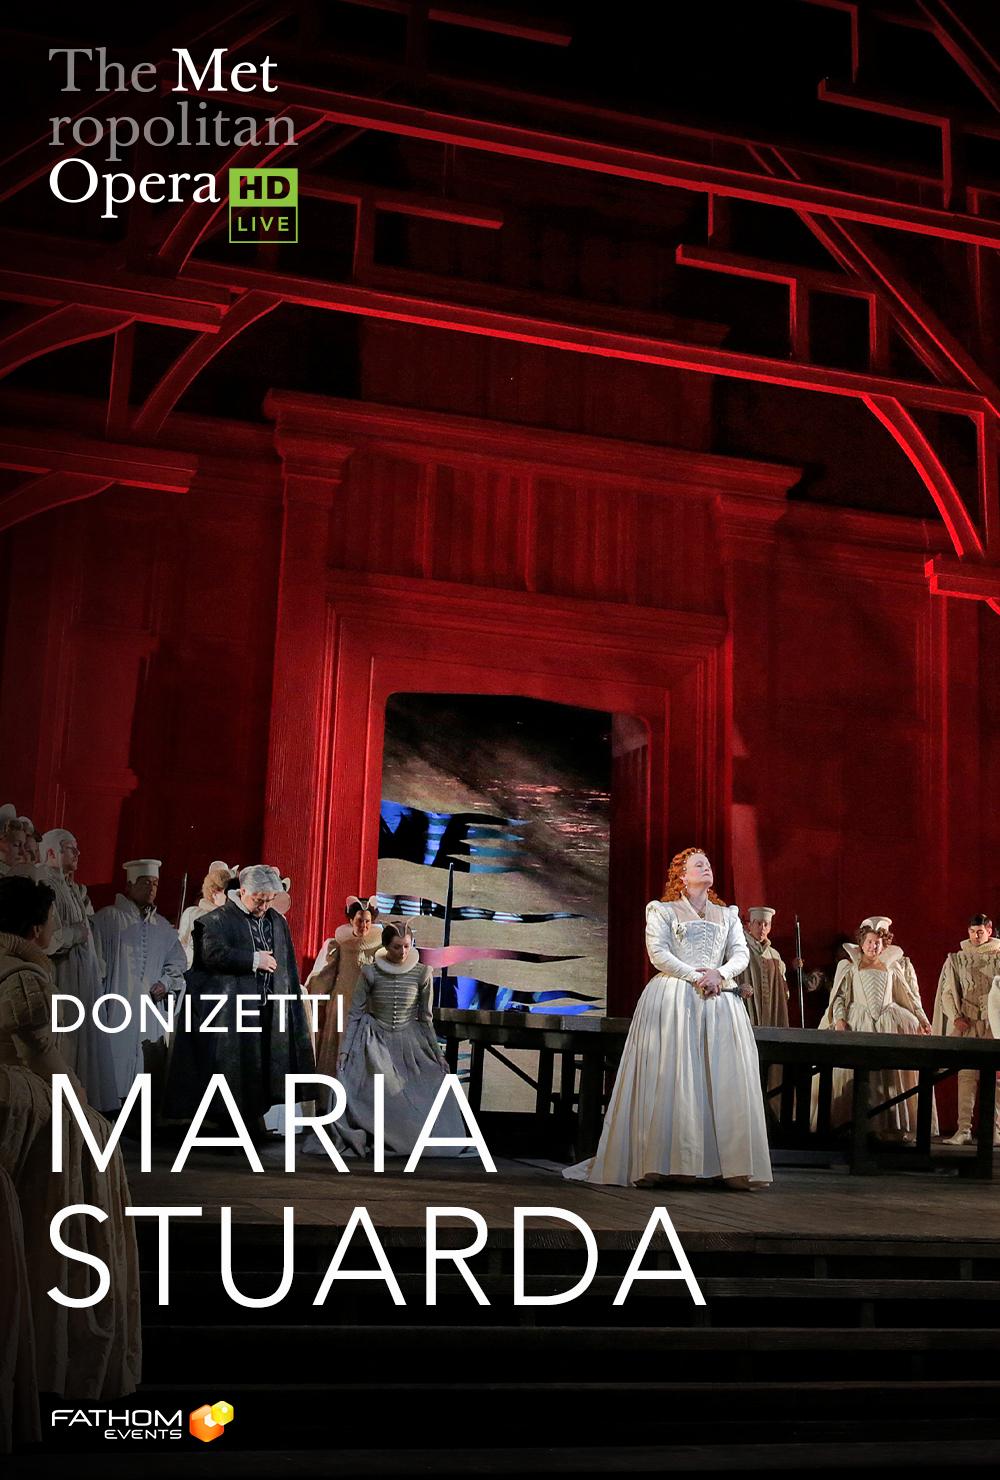 metropolitan opera live in hd theater